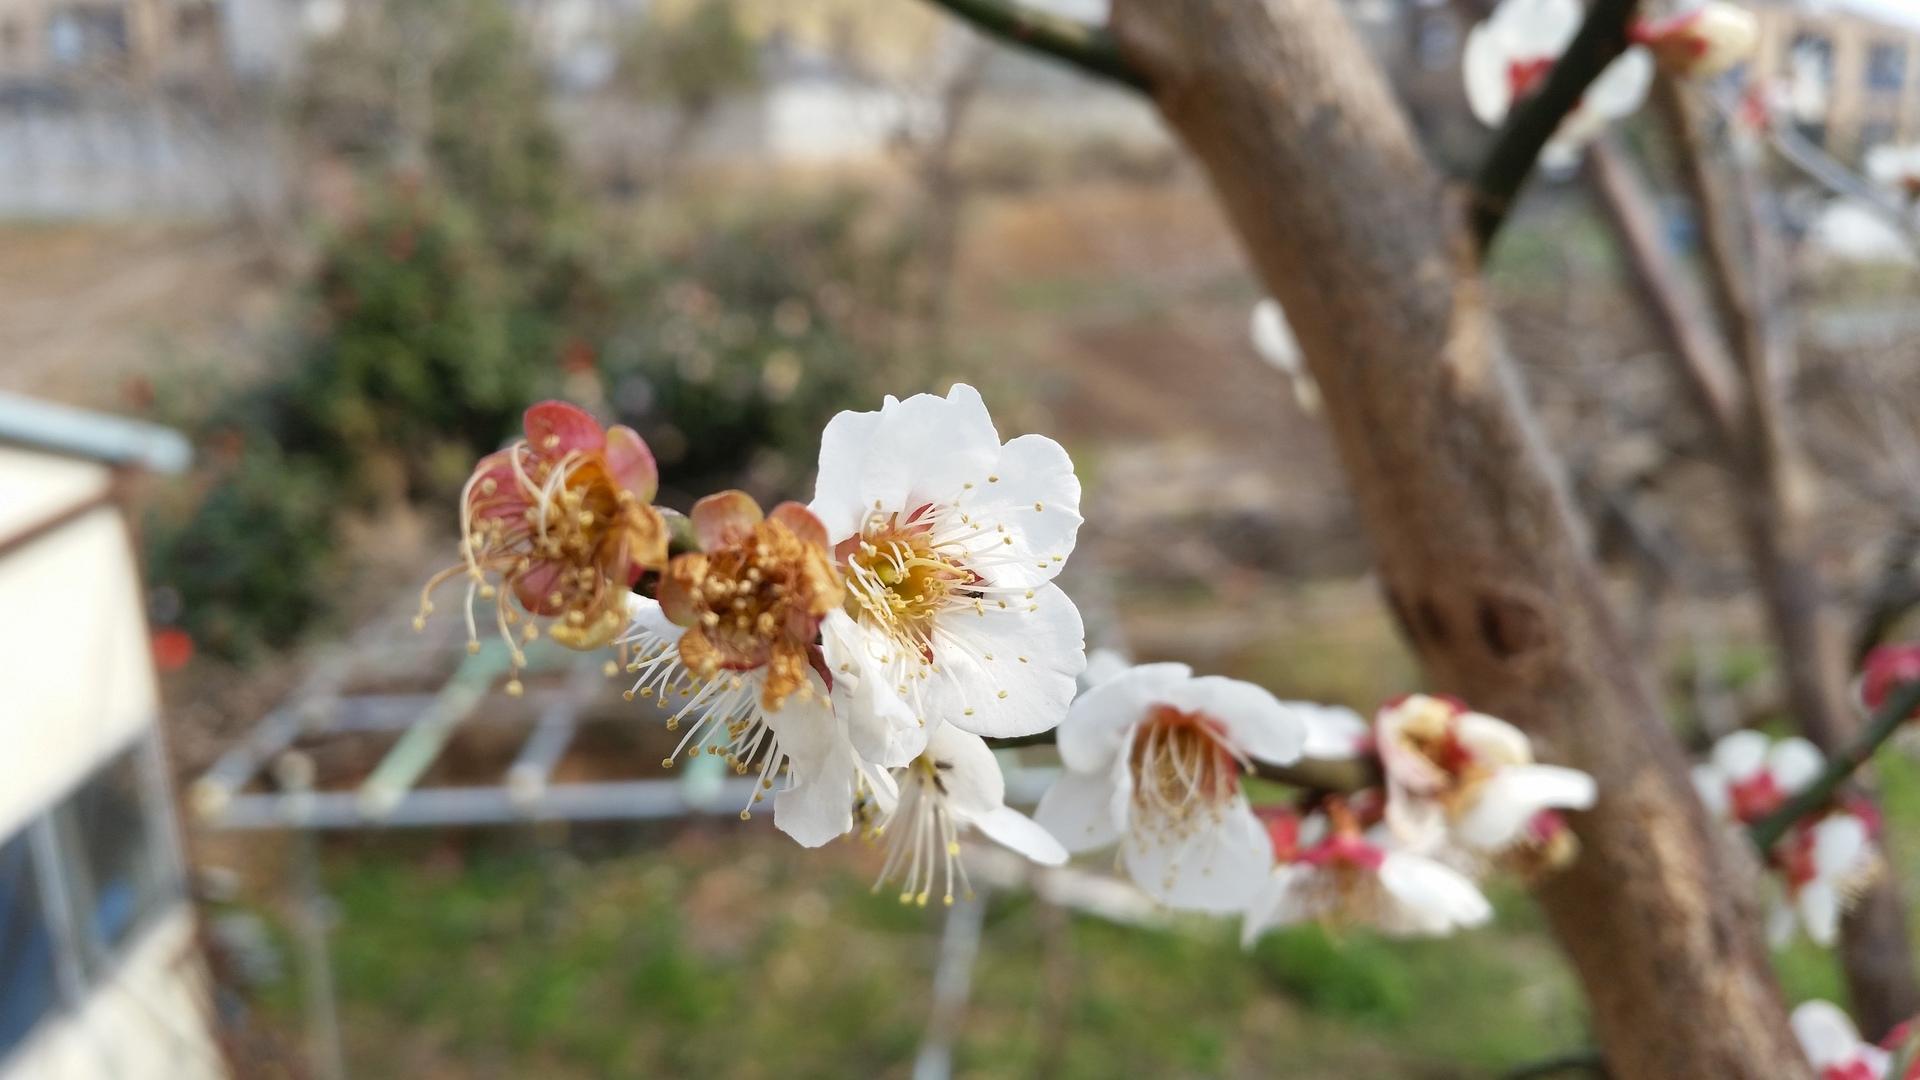 Flower of the plum | present4_u, apple, blooming, branch